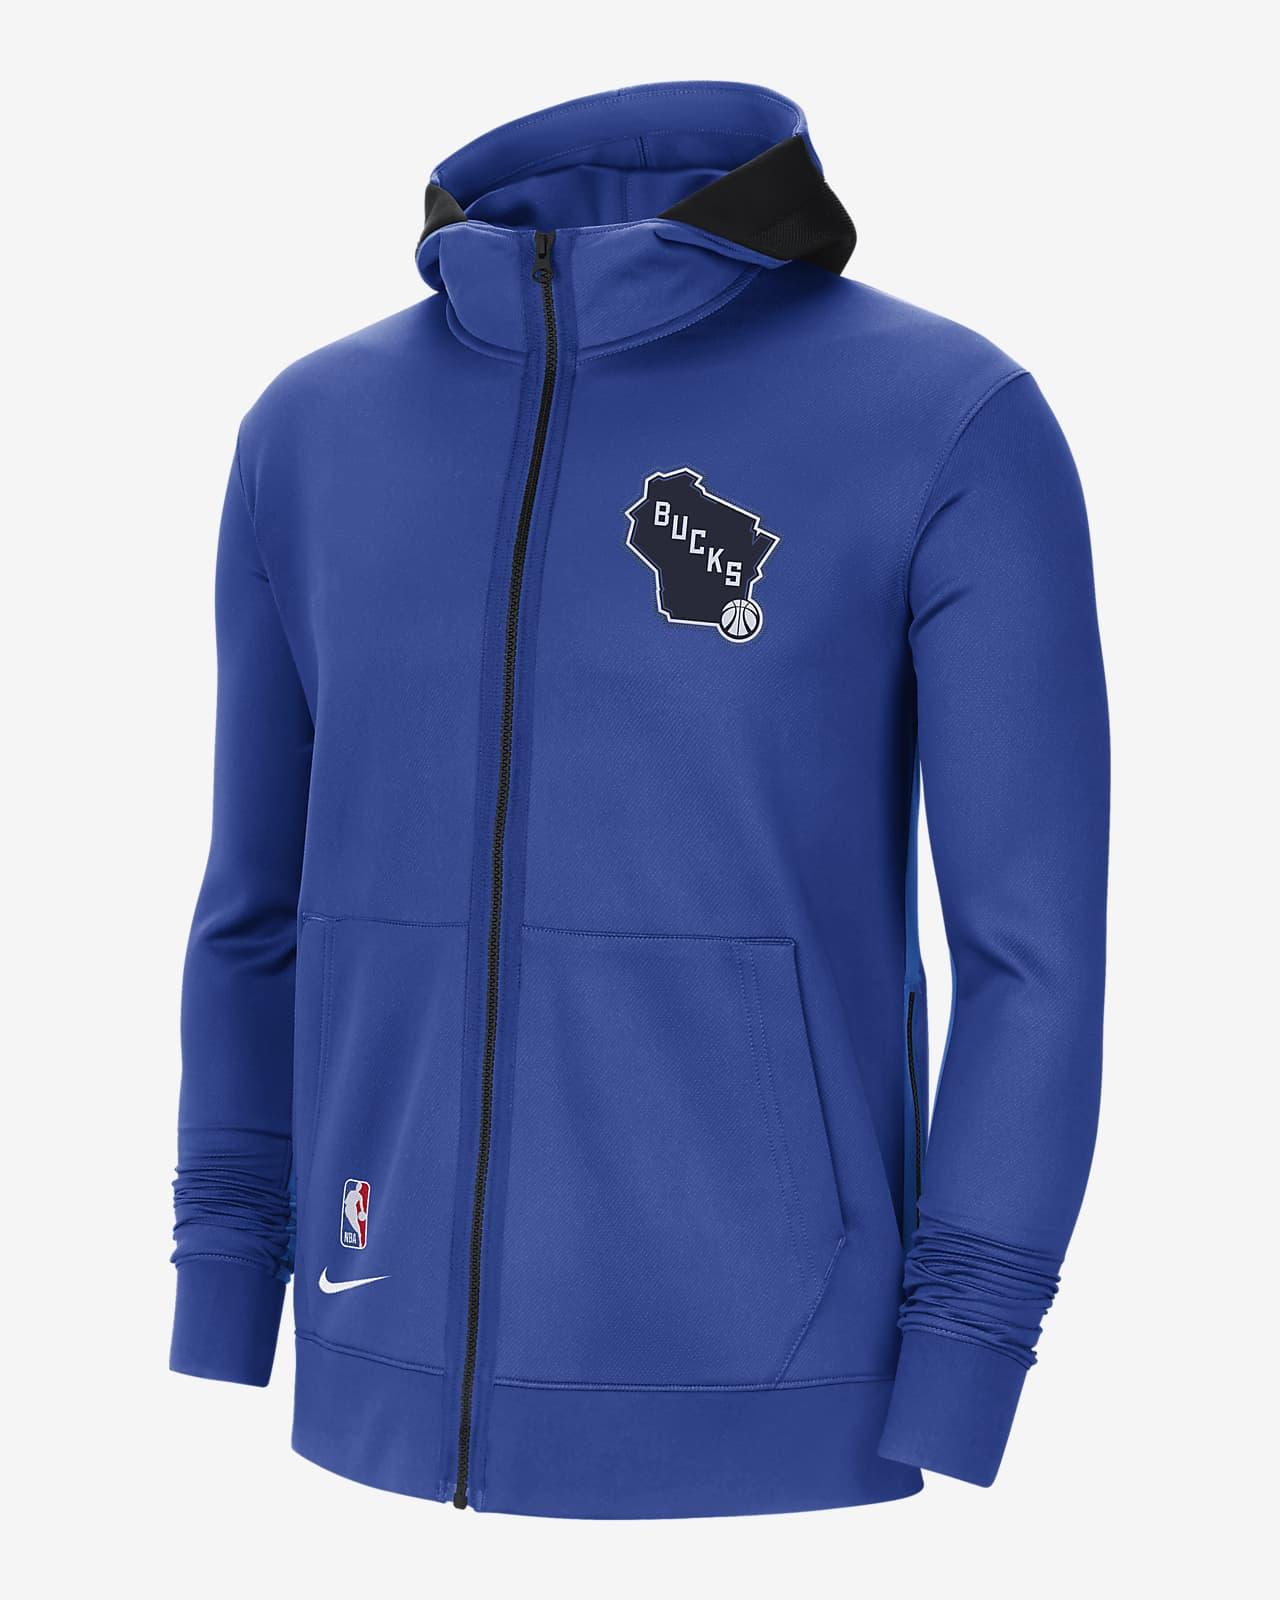 Milwaukee Bucks Showtime City Edition Men's Nike Therma Flex NBA Hoodie